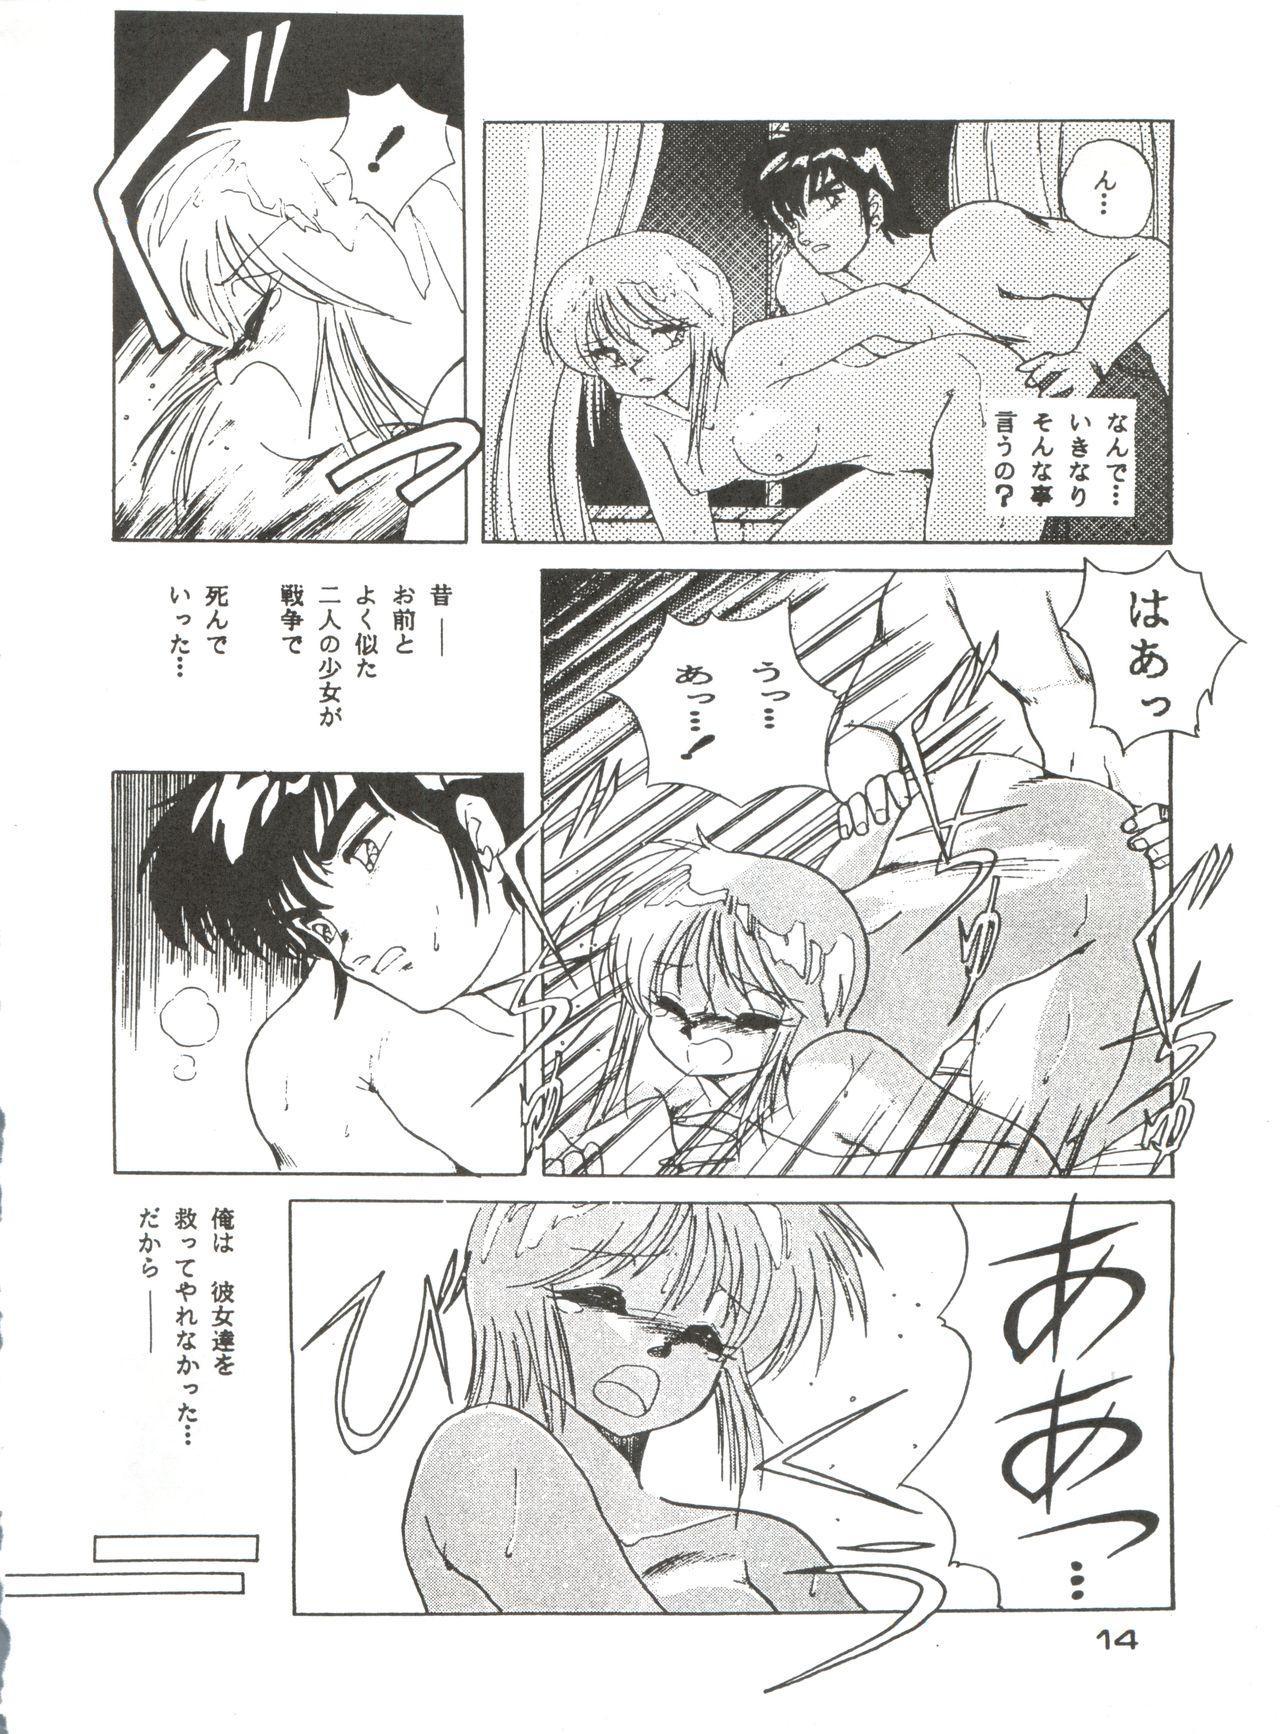 [Studio Fuck (Various) Onapet 7 (Sonic Soldier Borgman, Gundam ZZ, Osomatsu-kun) 13